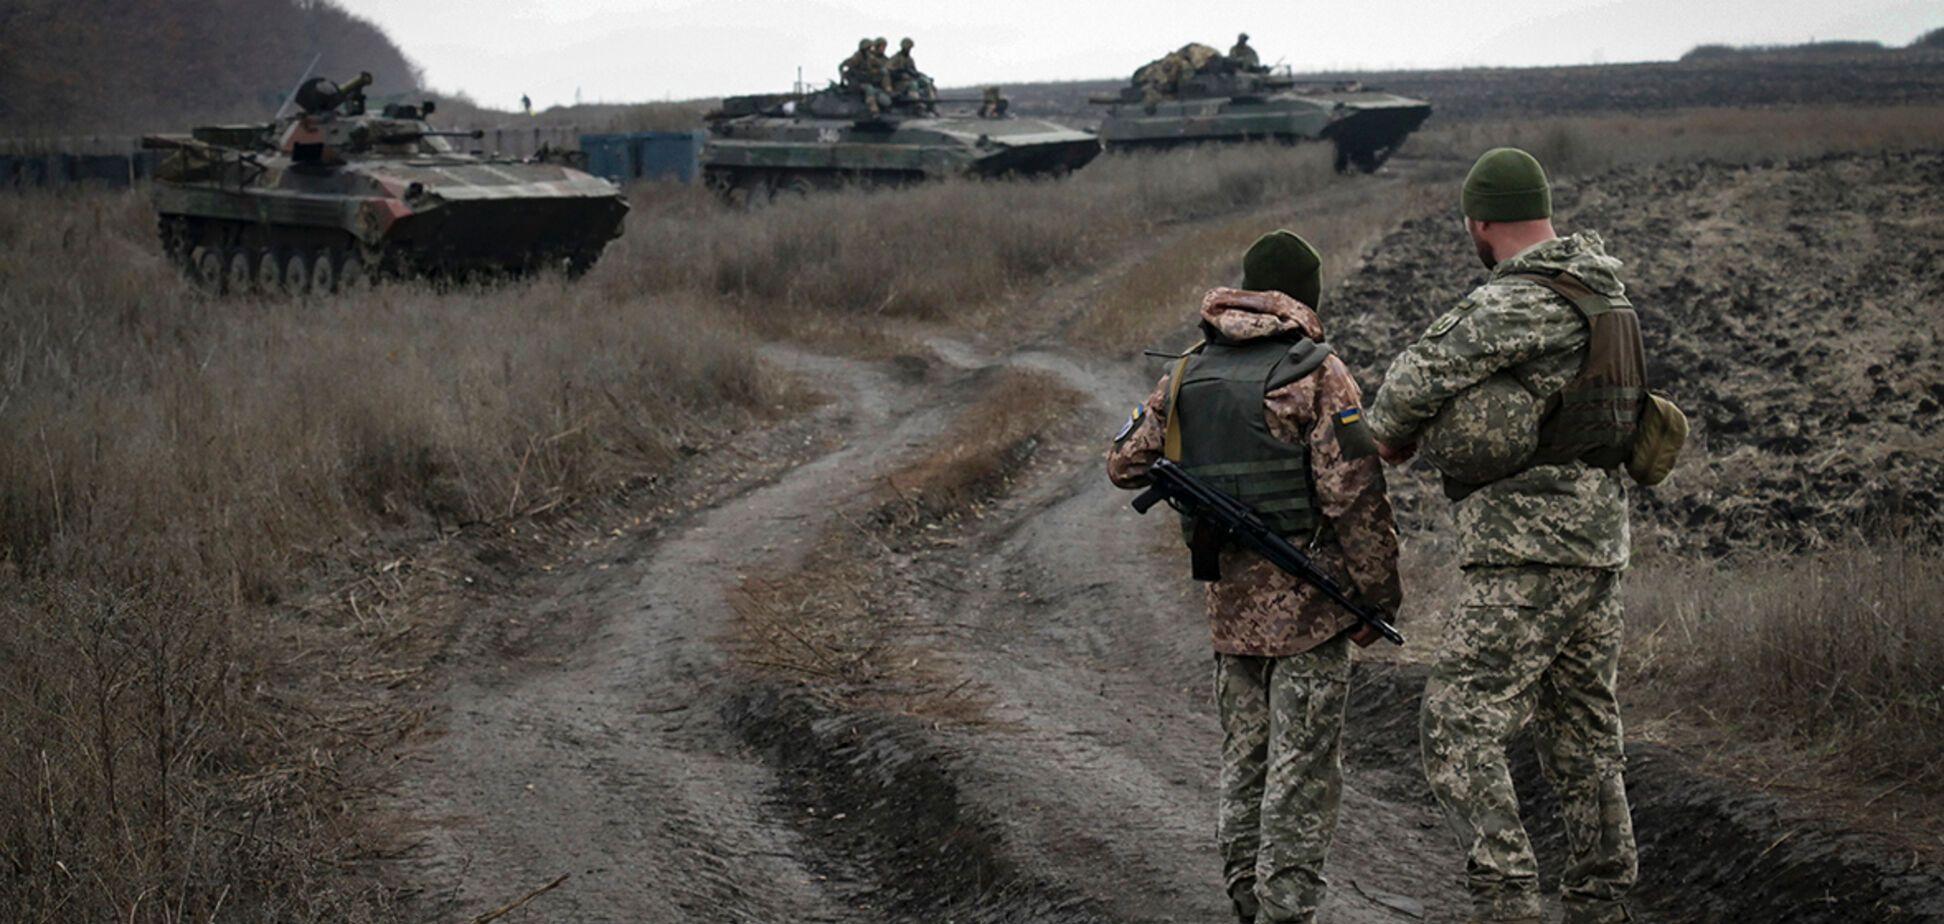 На Донбассе затихла стрельба: 'Л/ДНР' затаились